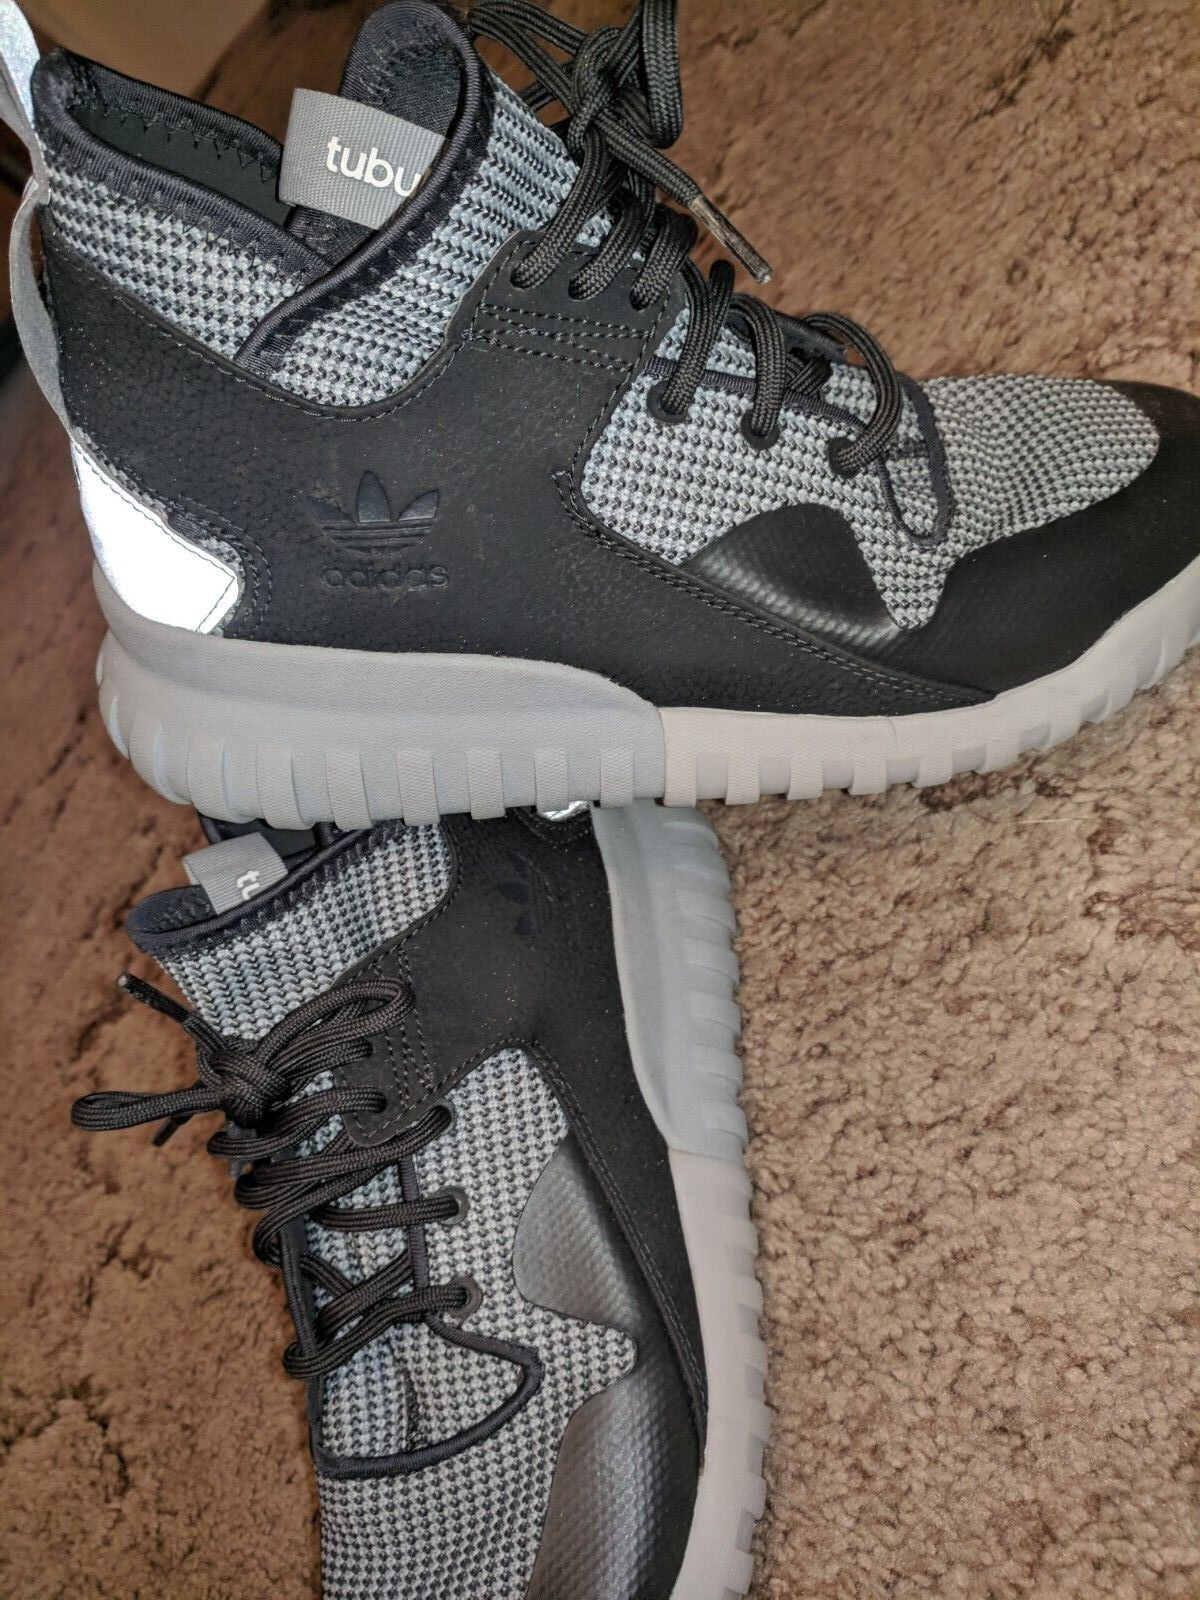 Adidas Tubular X Primeknit Alphabounce Springblade shoes Size 8